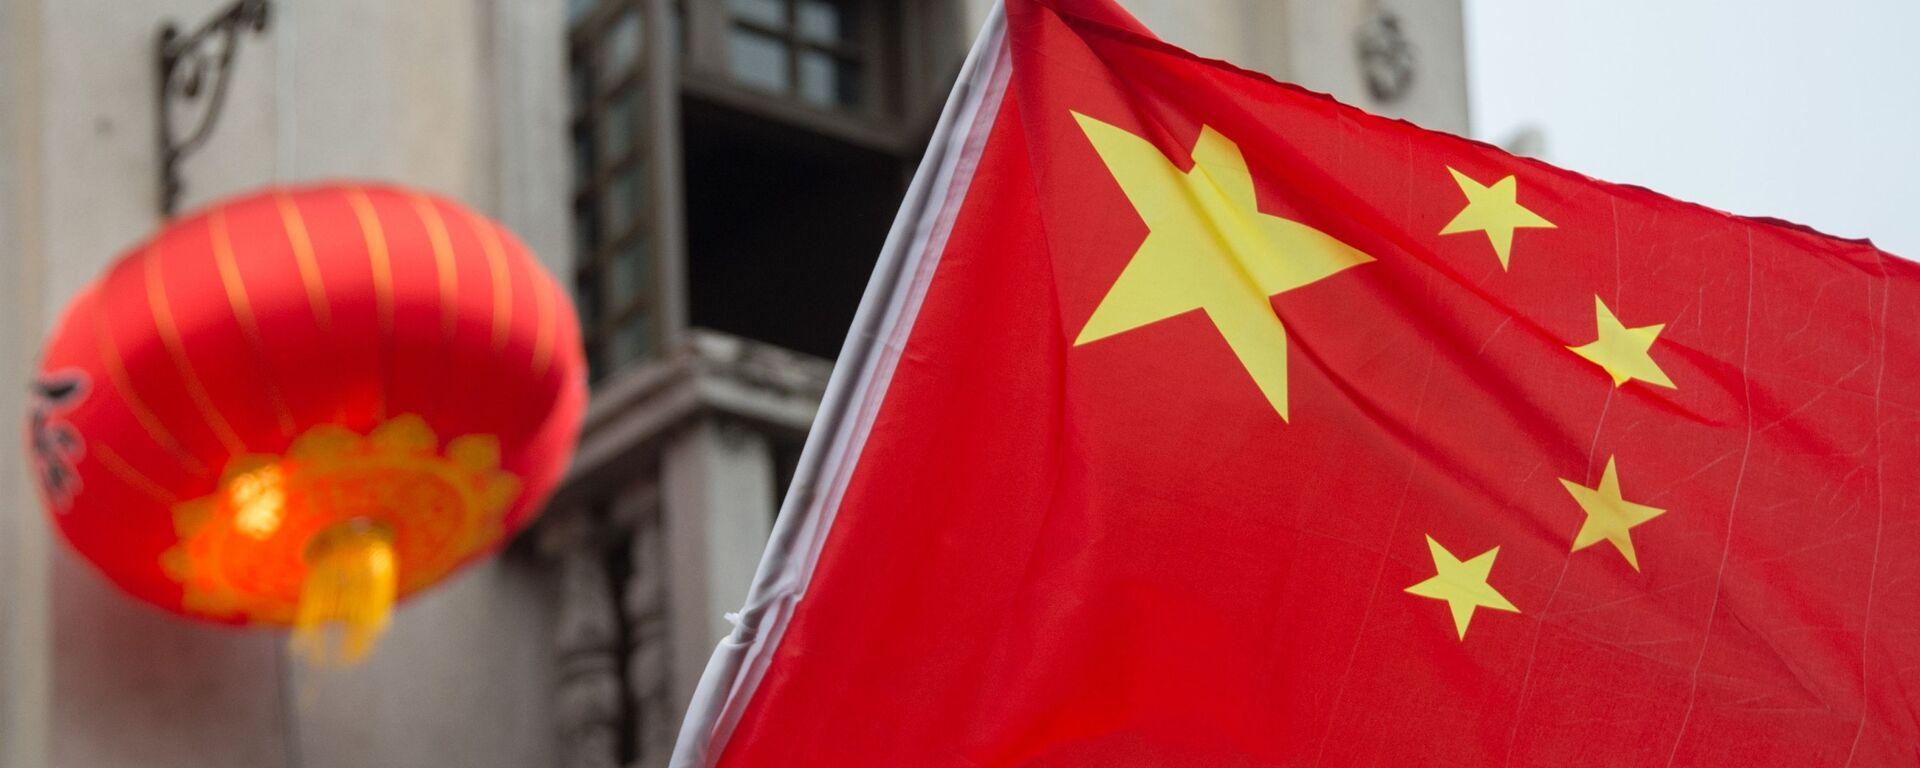 La bandera de China - Sputnik Mundo, 1920, 10.06.2021